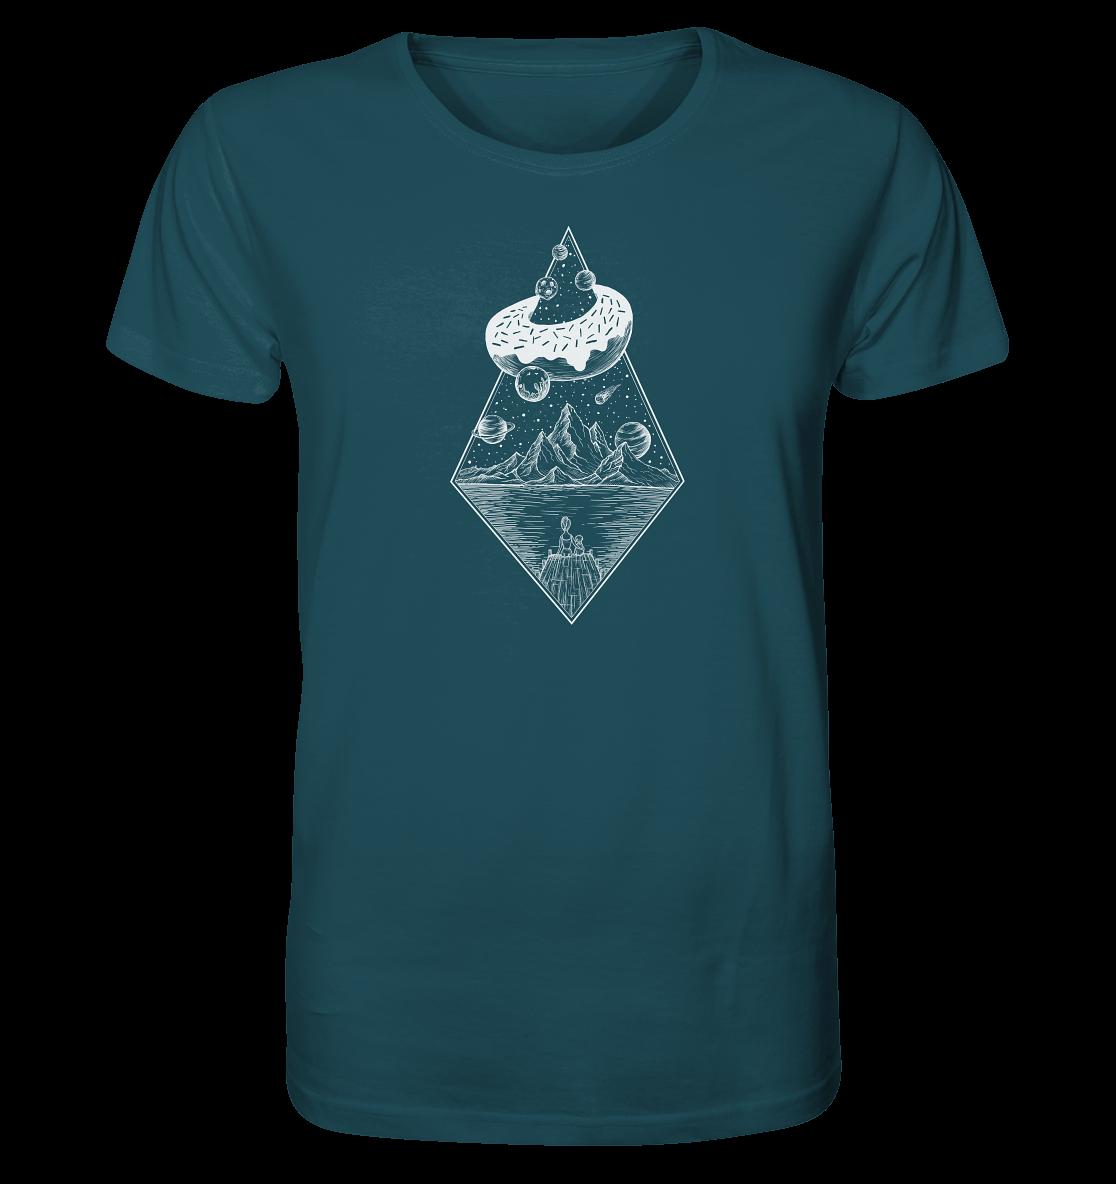 front-organic-shirt-204d59-1116x-1.png